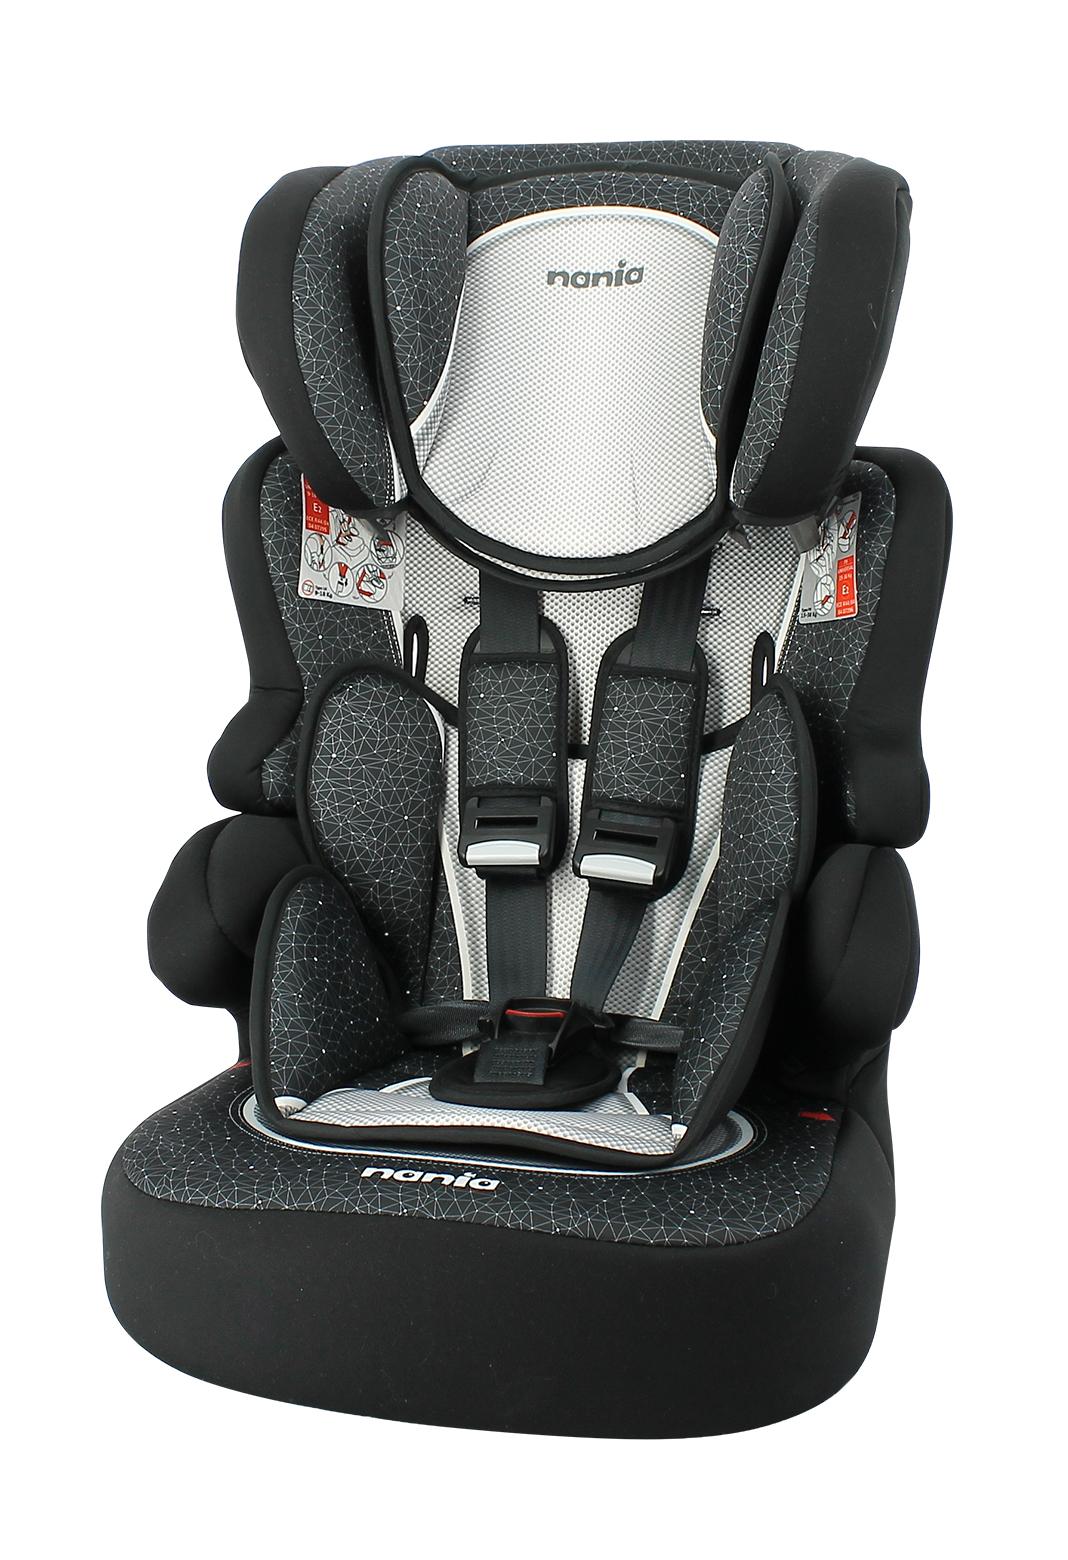 Autostoel Nania Beline SP Skyline Black 1 2 3